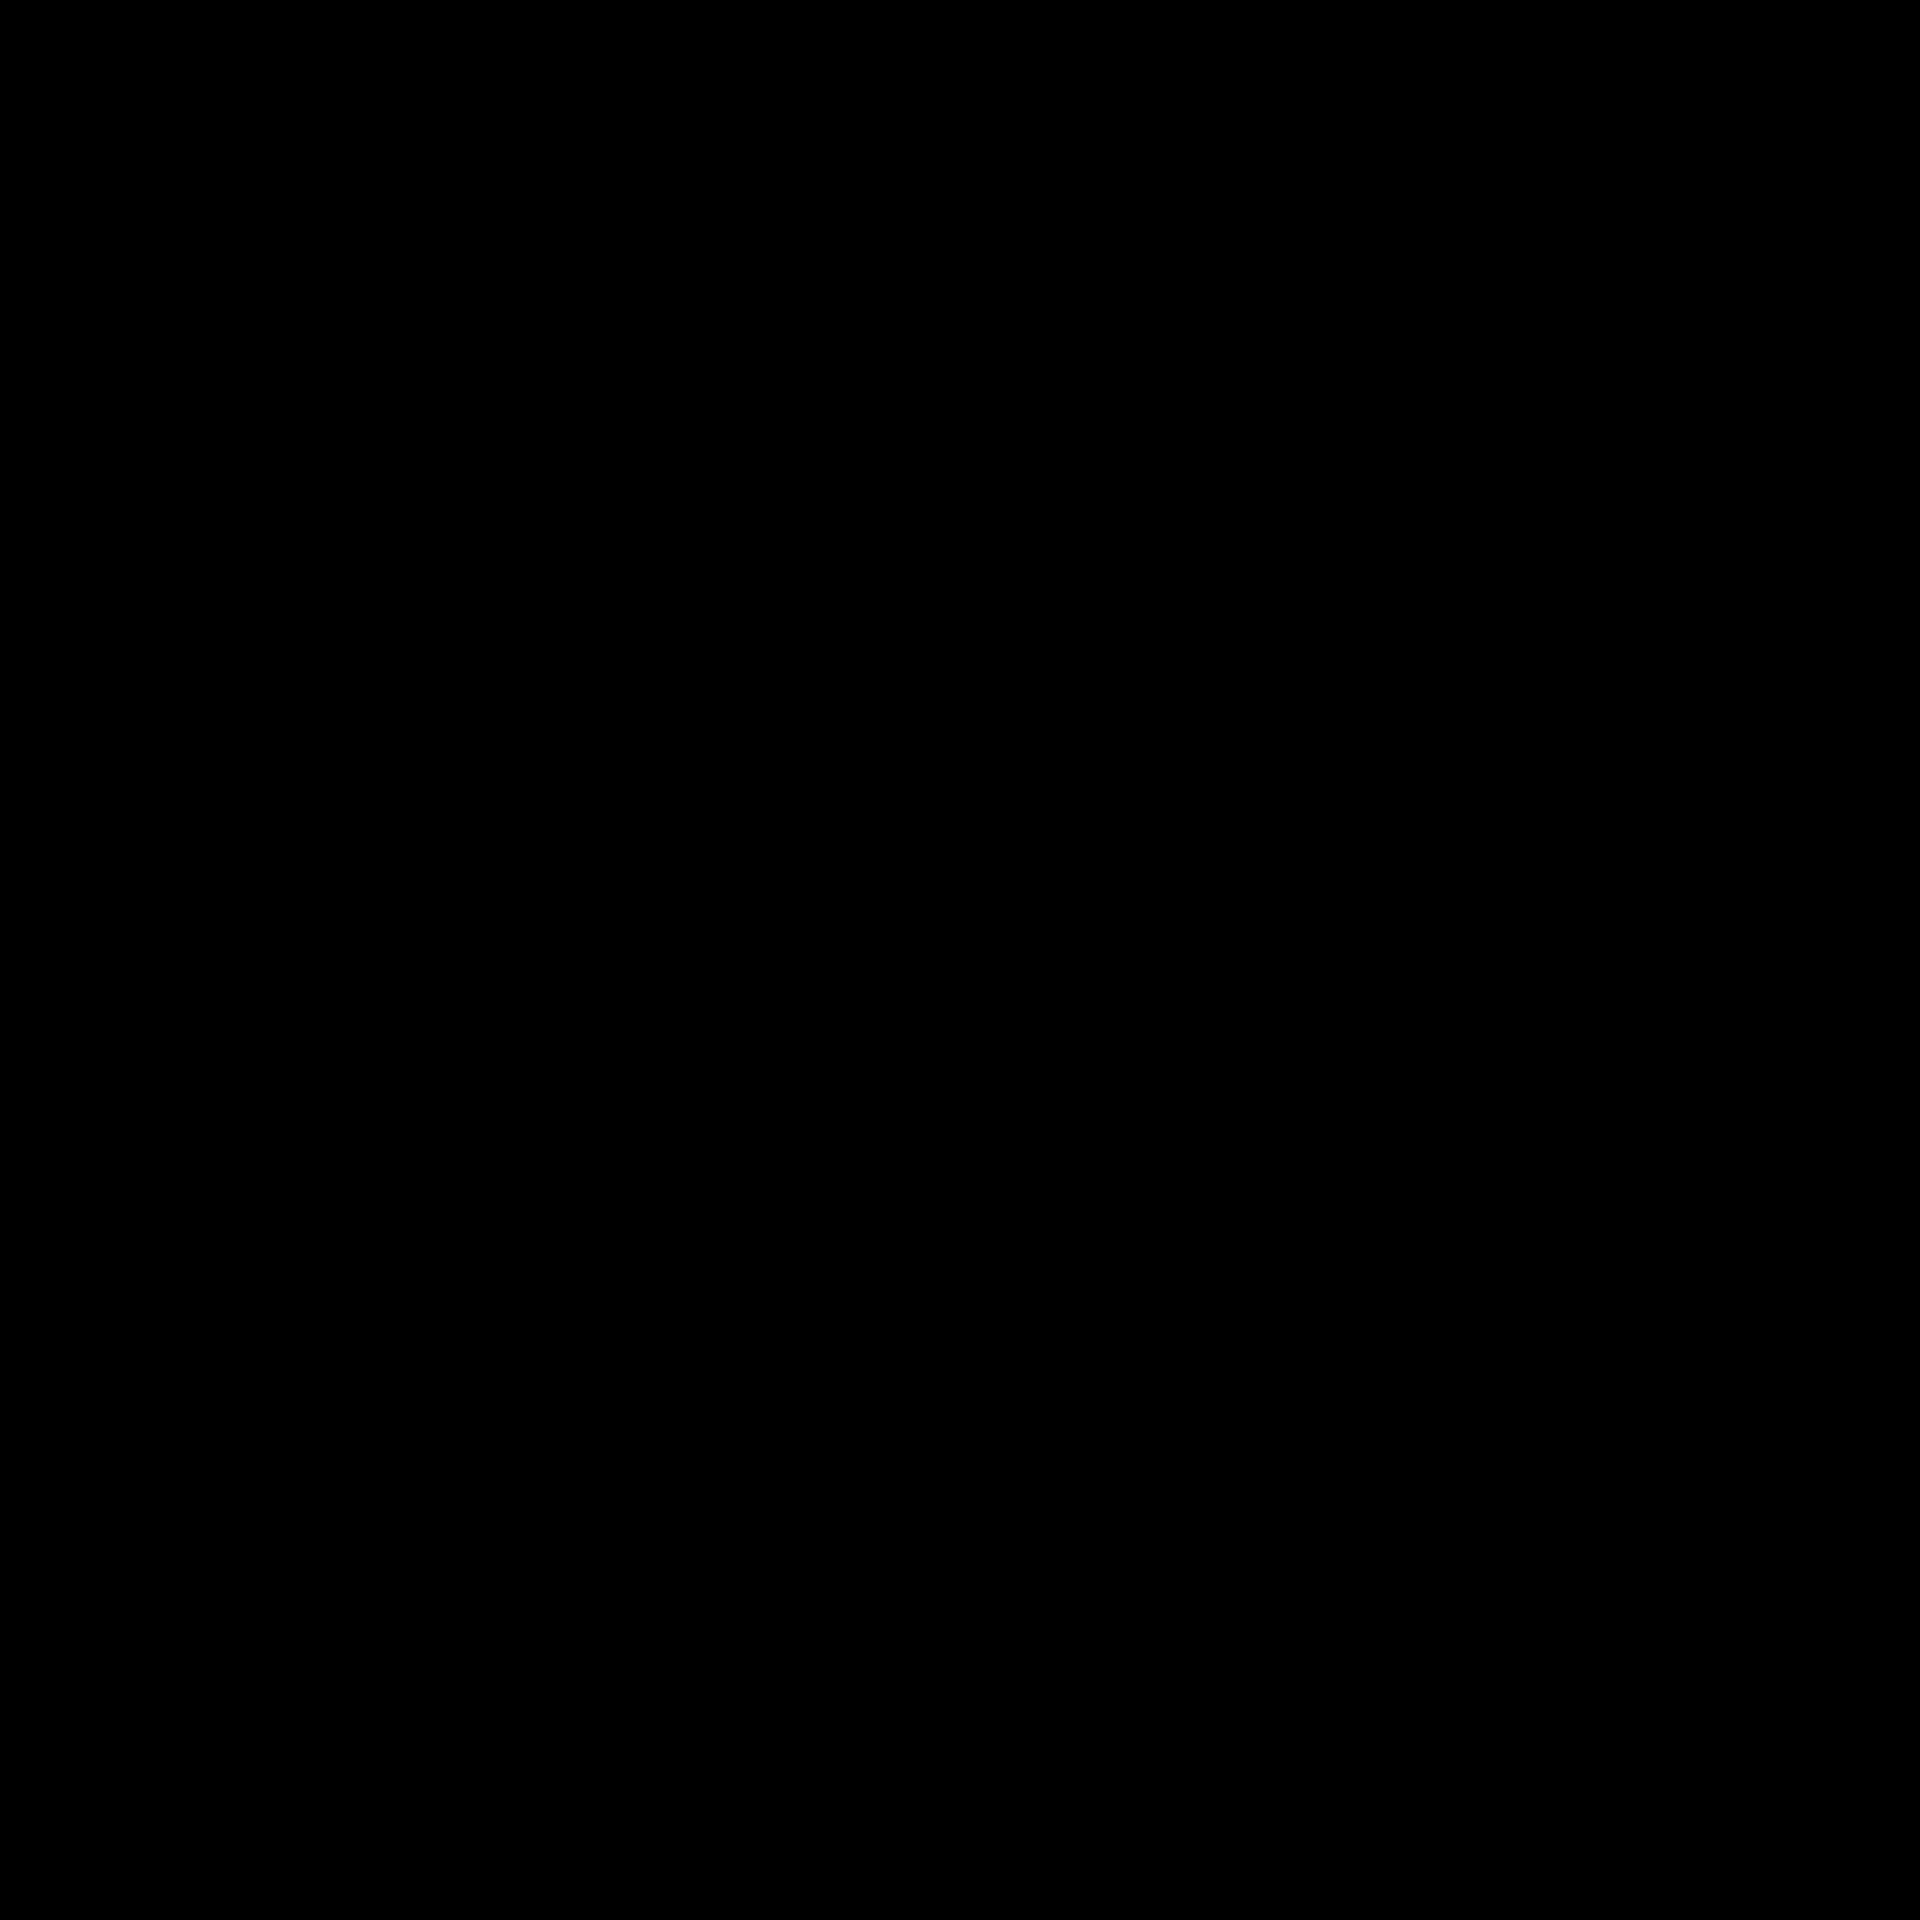 eye illusions distortion - HD1706×1706